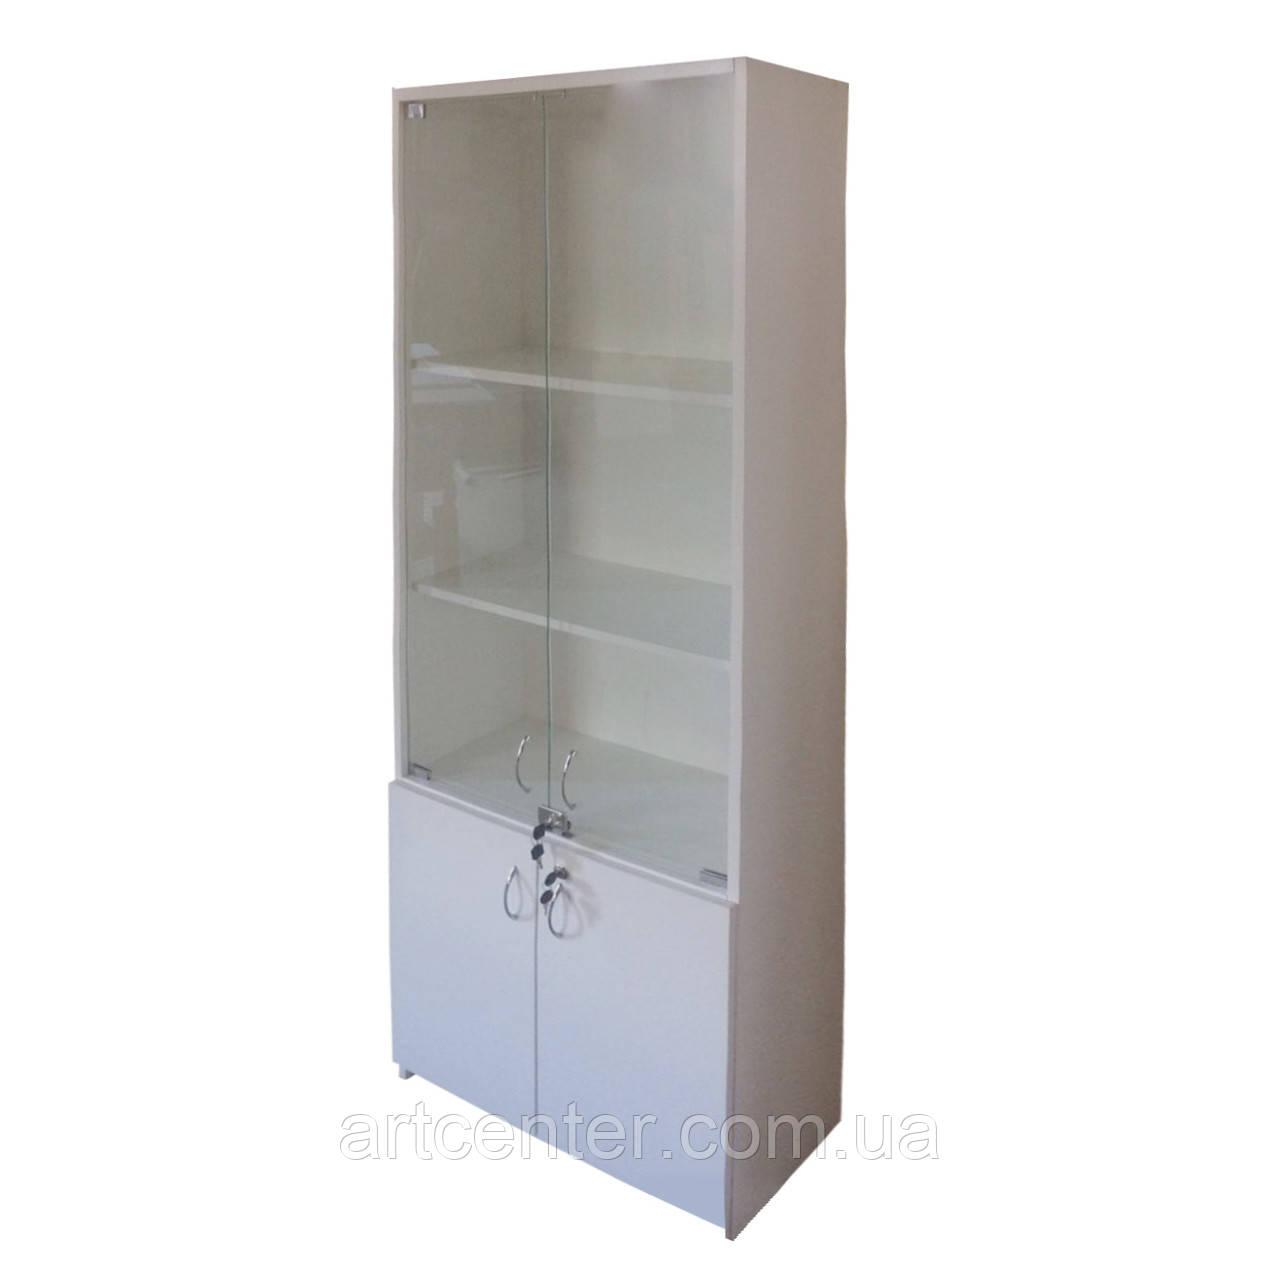 Шкаф-витрина с полочками ЛДСП